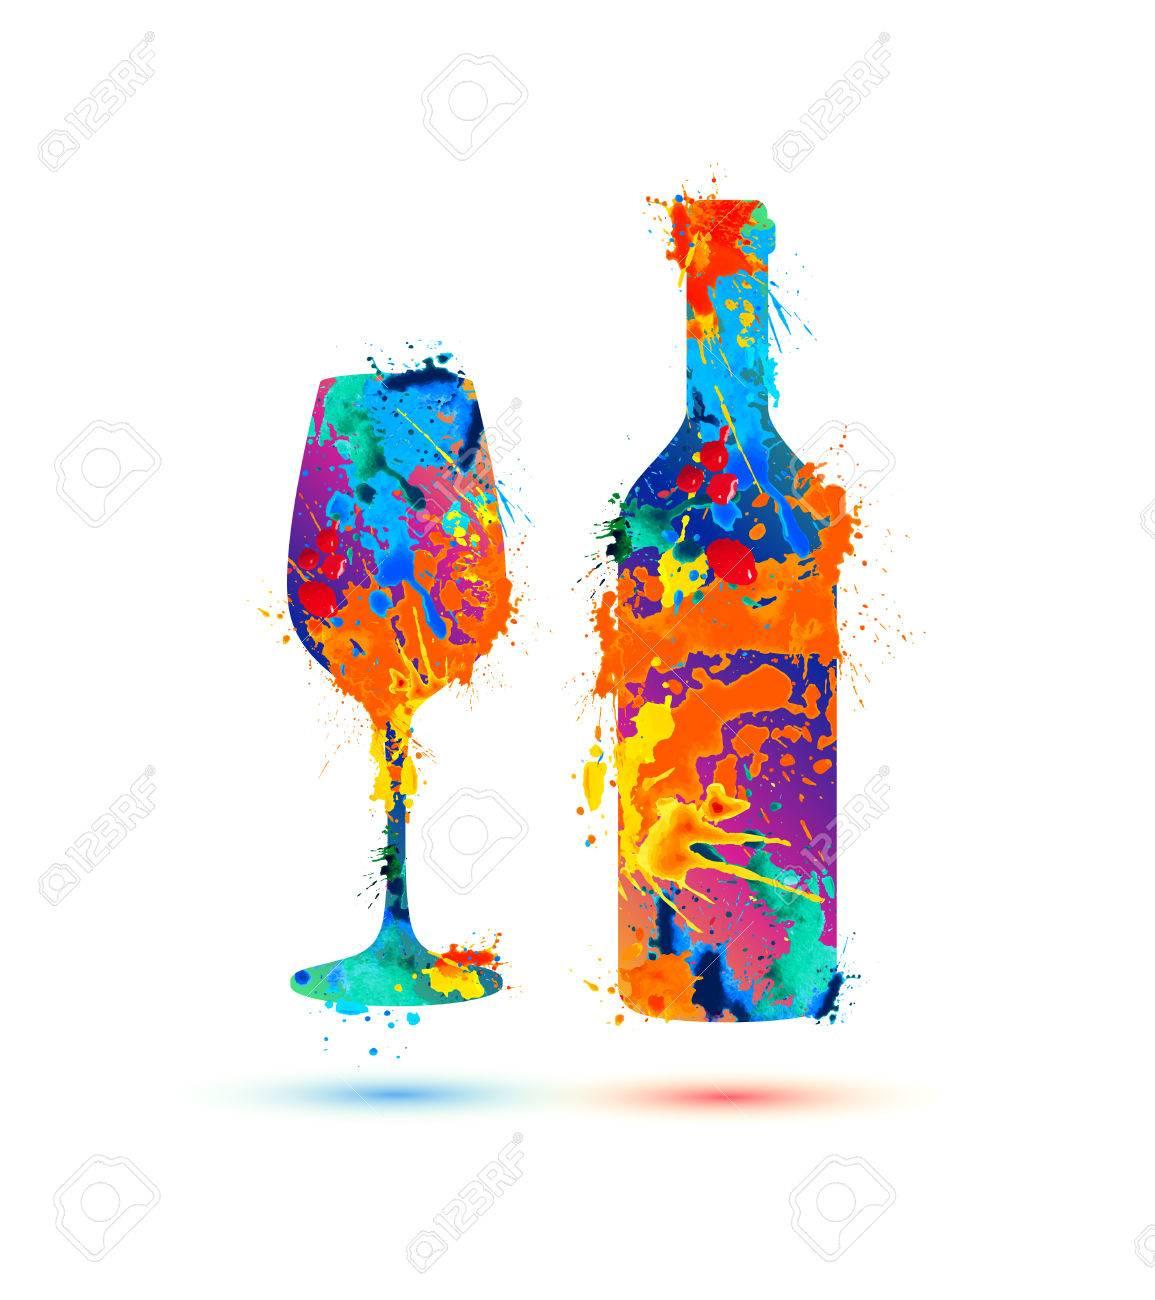 Wine glass and bottle. Vector splash paint - 66060598